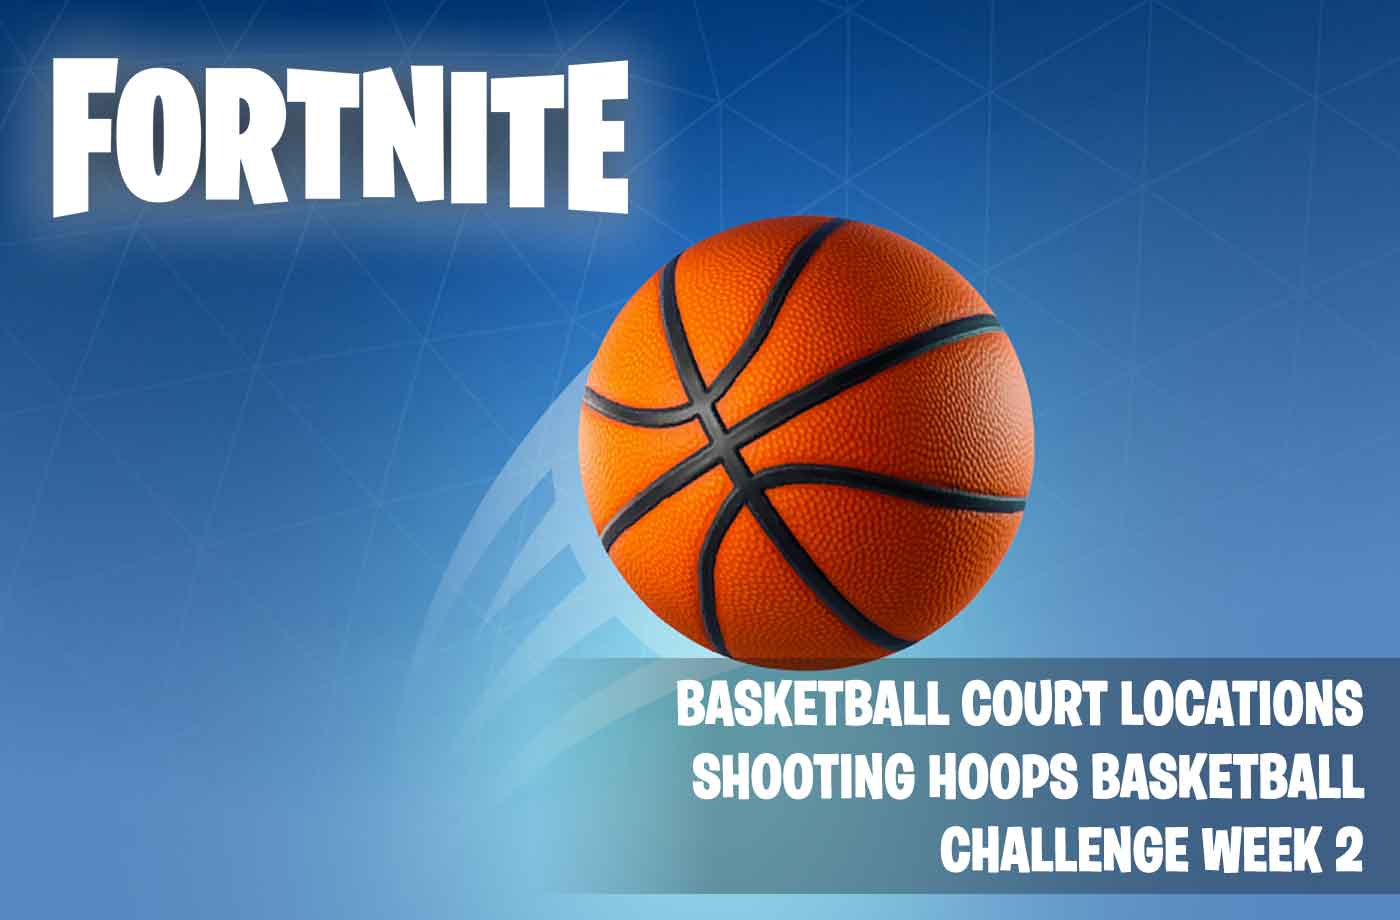 fortnite basketball court locations shooting hoops basketball challenge week 2 - hoops fortnite